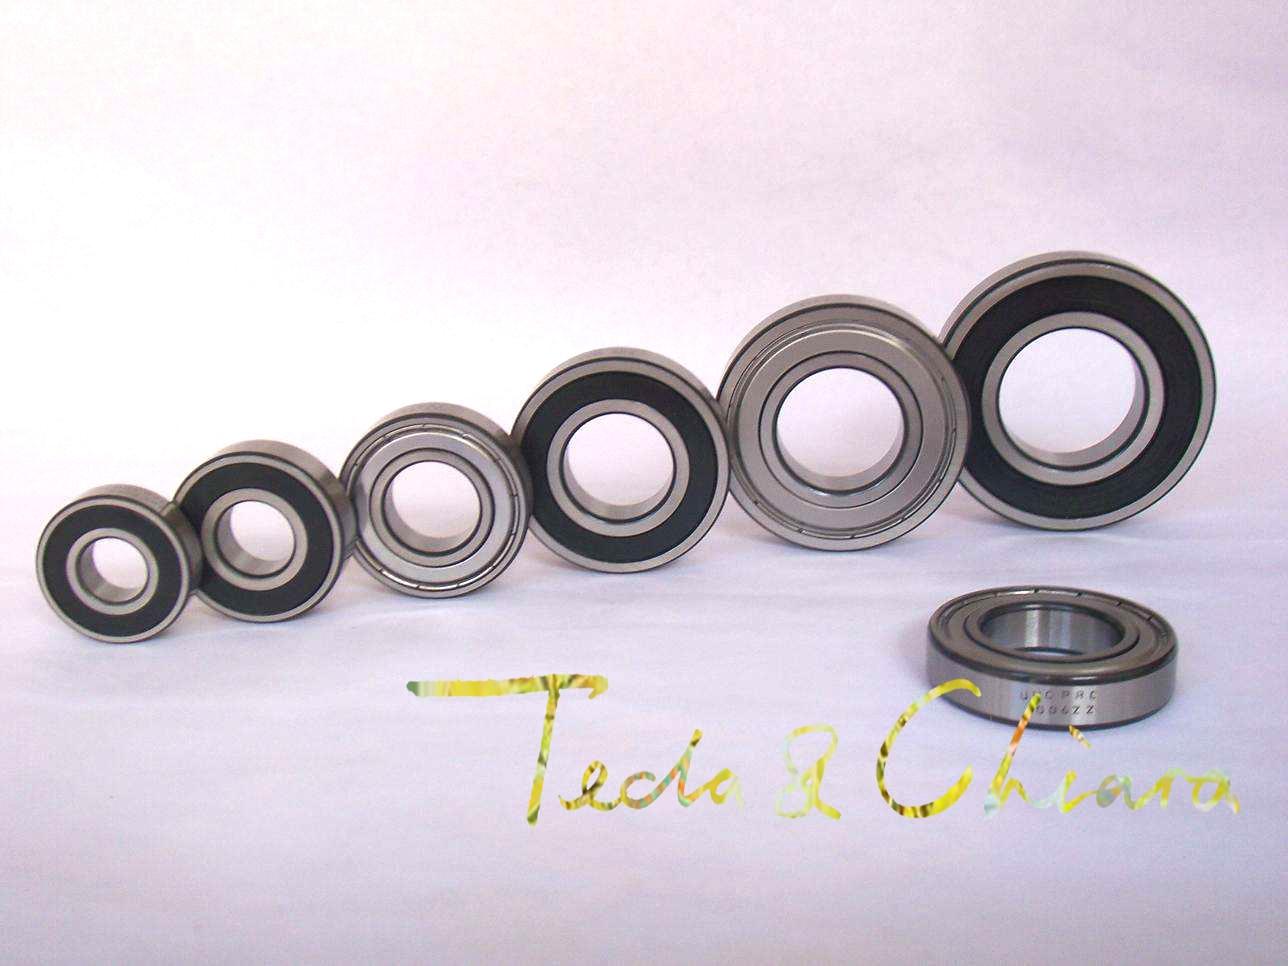 688 688ZZ 688RS 688-2Z 688Z 688-2RS ZZ RS RZ 2RZ Deep Groove Ball Bearings 8 x 16 x 5mm High Quality mr74 674zz 674rs mr74zz mr74rs mr74 2z mr74z mr74 2rs 674 674z zz rs rz 2rz deep groove ball bearings 4 x 7 x 2 5mm high quality